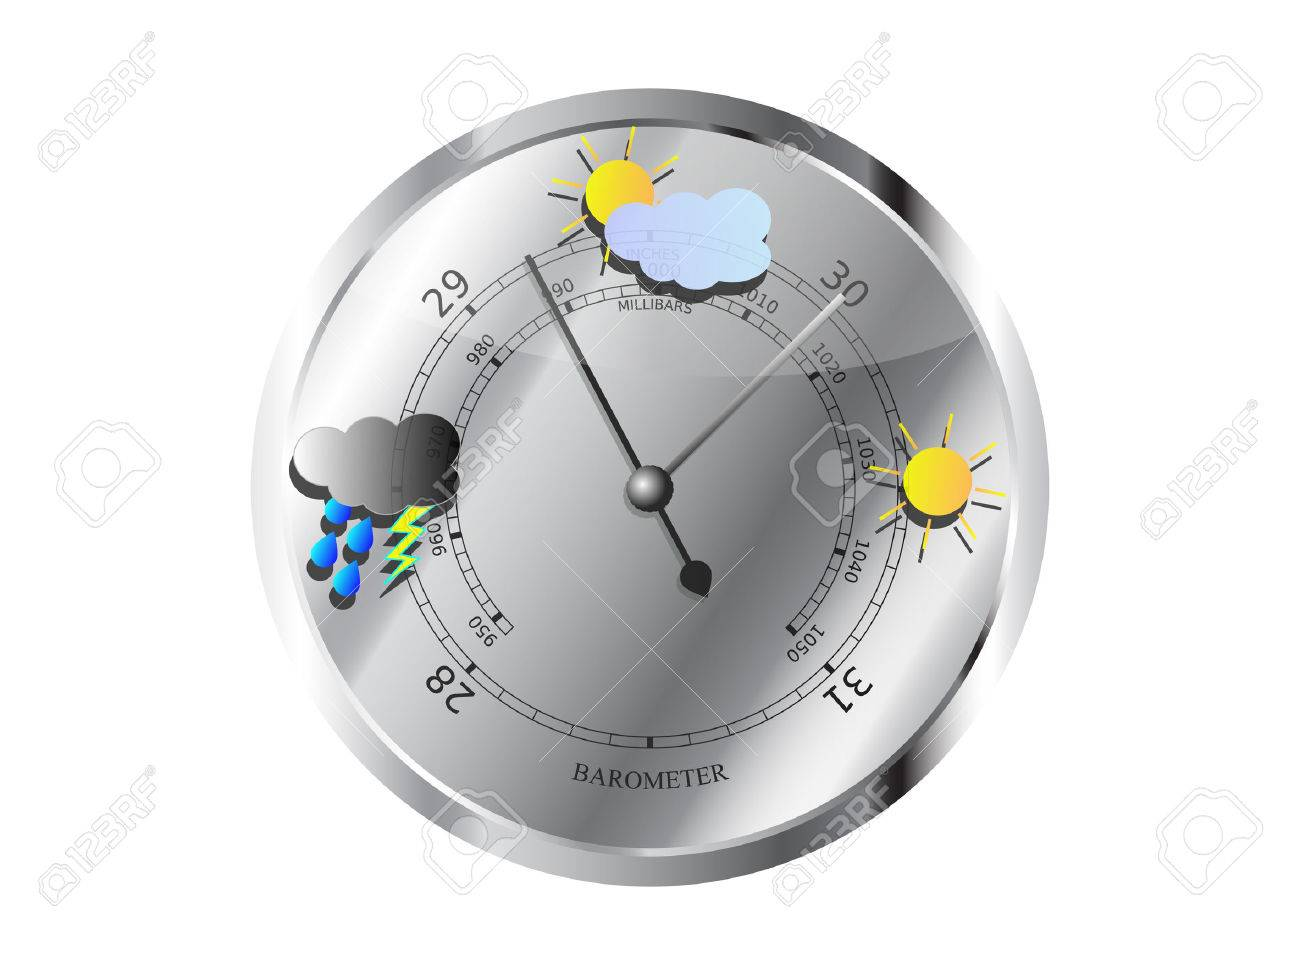 Metal barometer with weather symbols vector illustration - 47463662